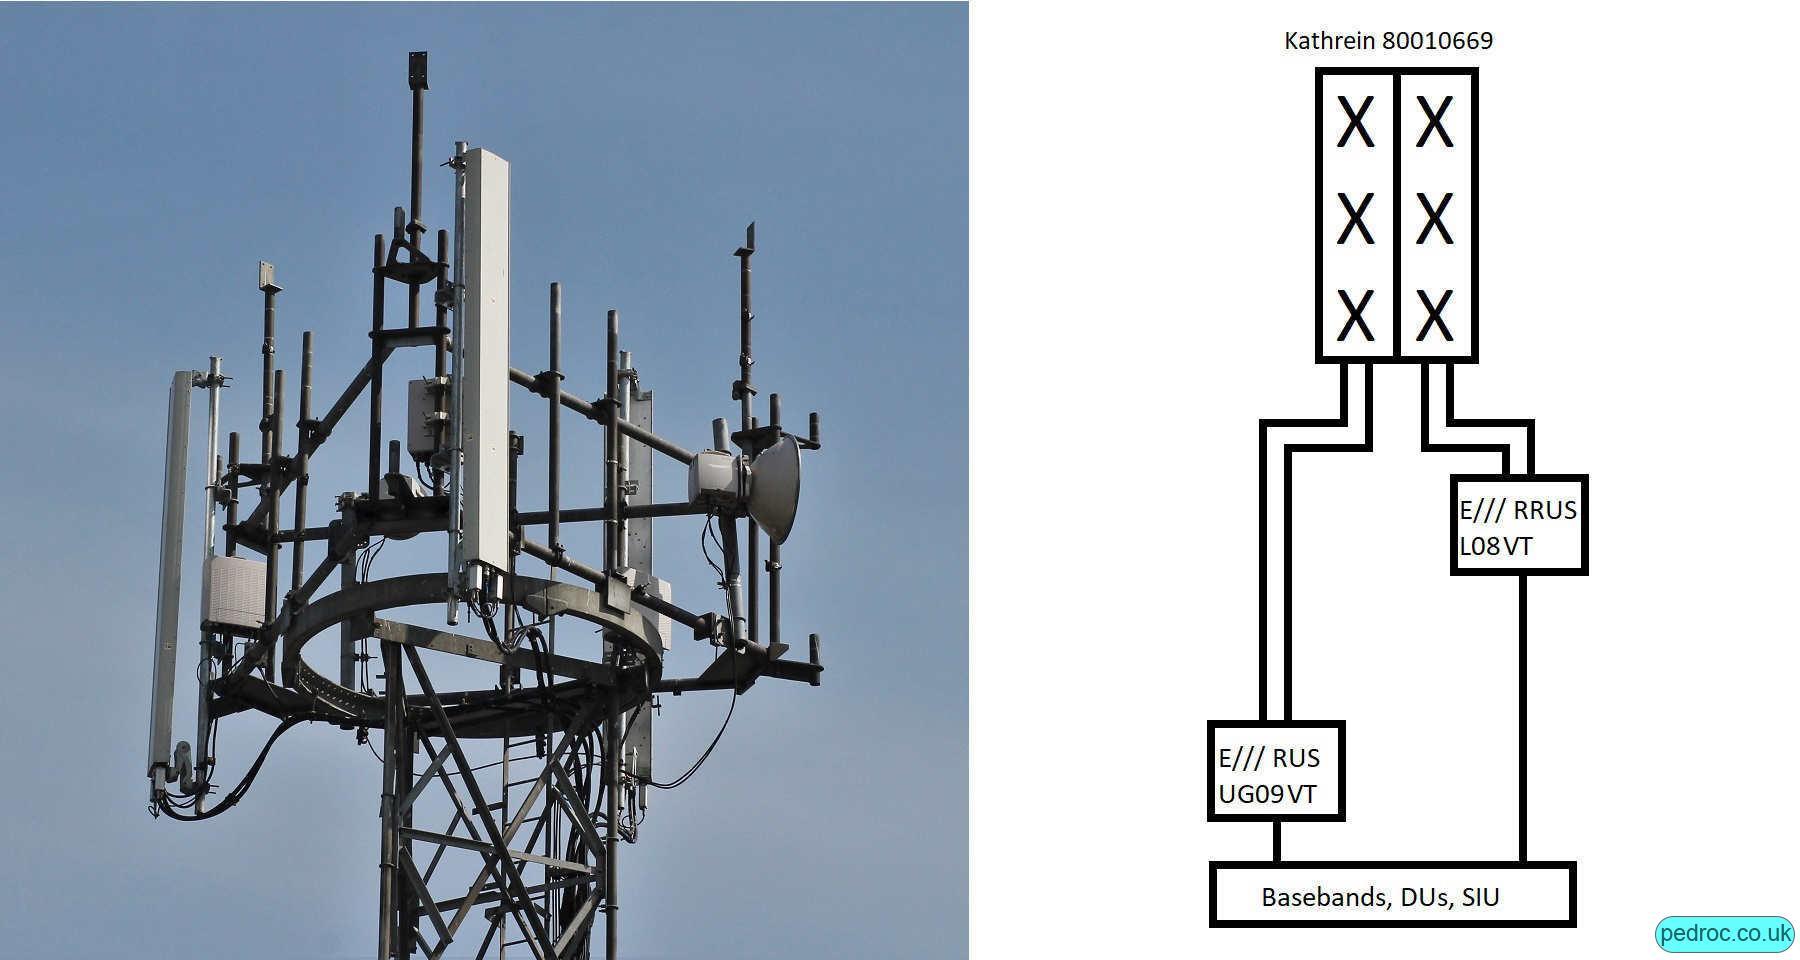 Low band low capacity O2 Ericsson site with Kathrein 80010669 antennas and Ericsson RRUS11